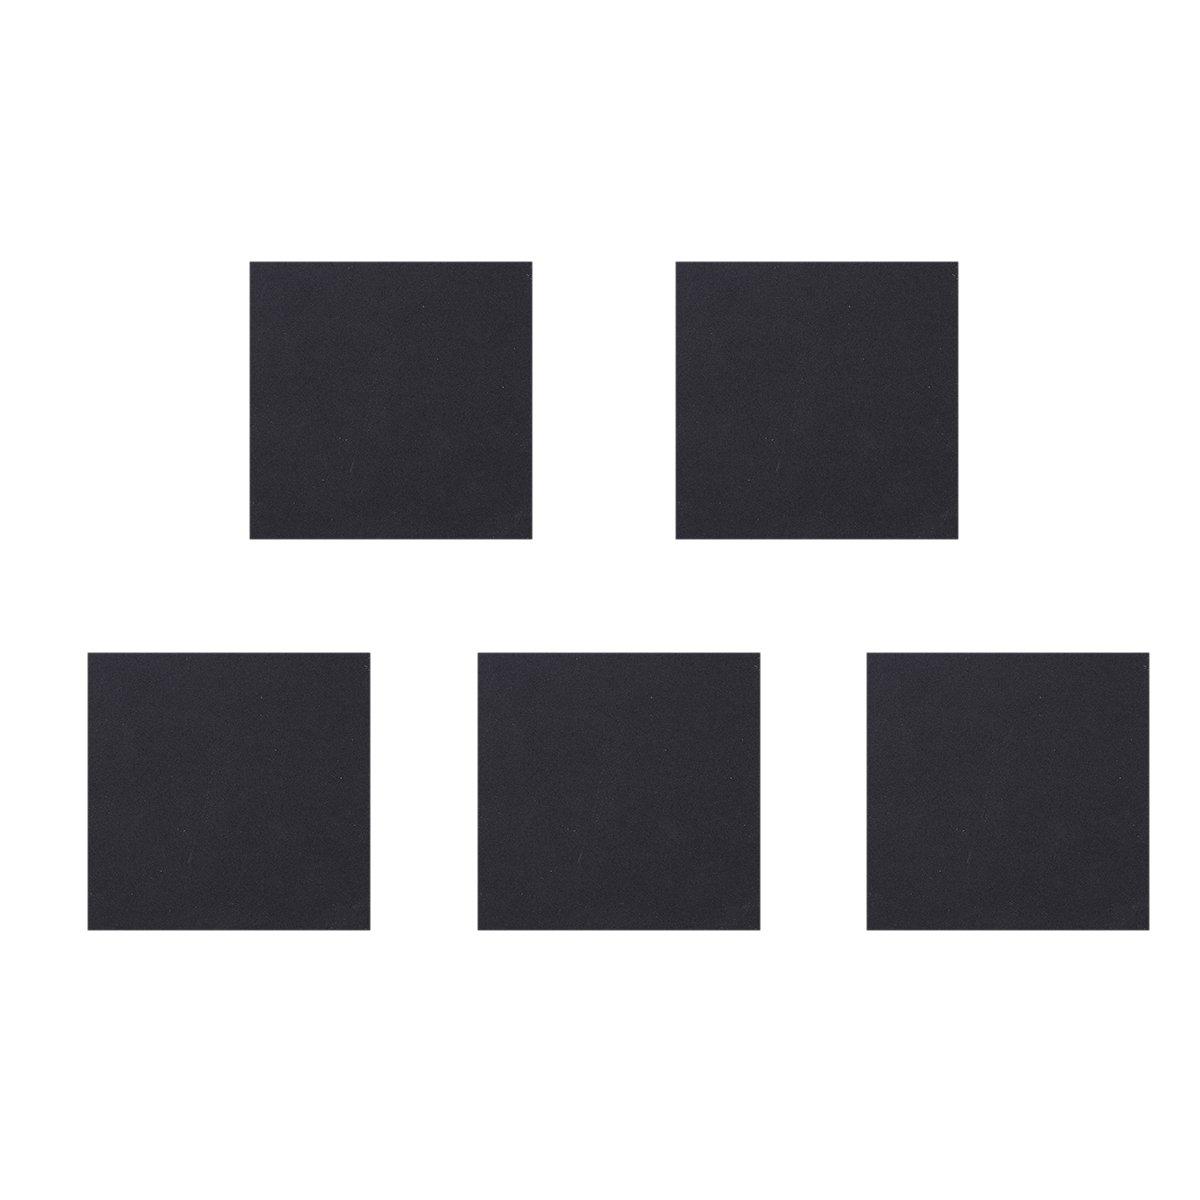 ueetek 5 Pieces Sponge Foam Neoprene Rubber Anti-Vibration Pads Mats of Vibration Isolation 150 x 150 x 5 mm (Black)